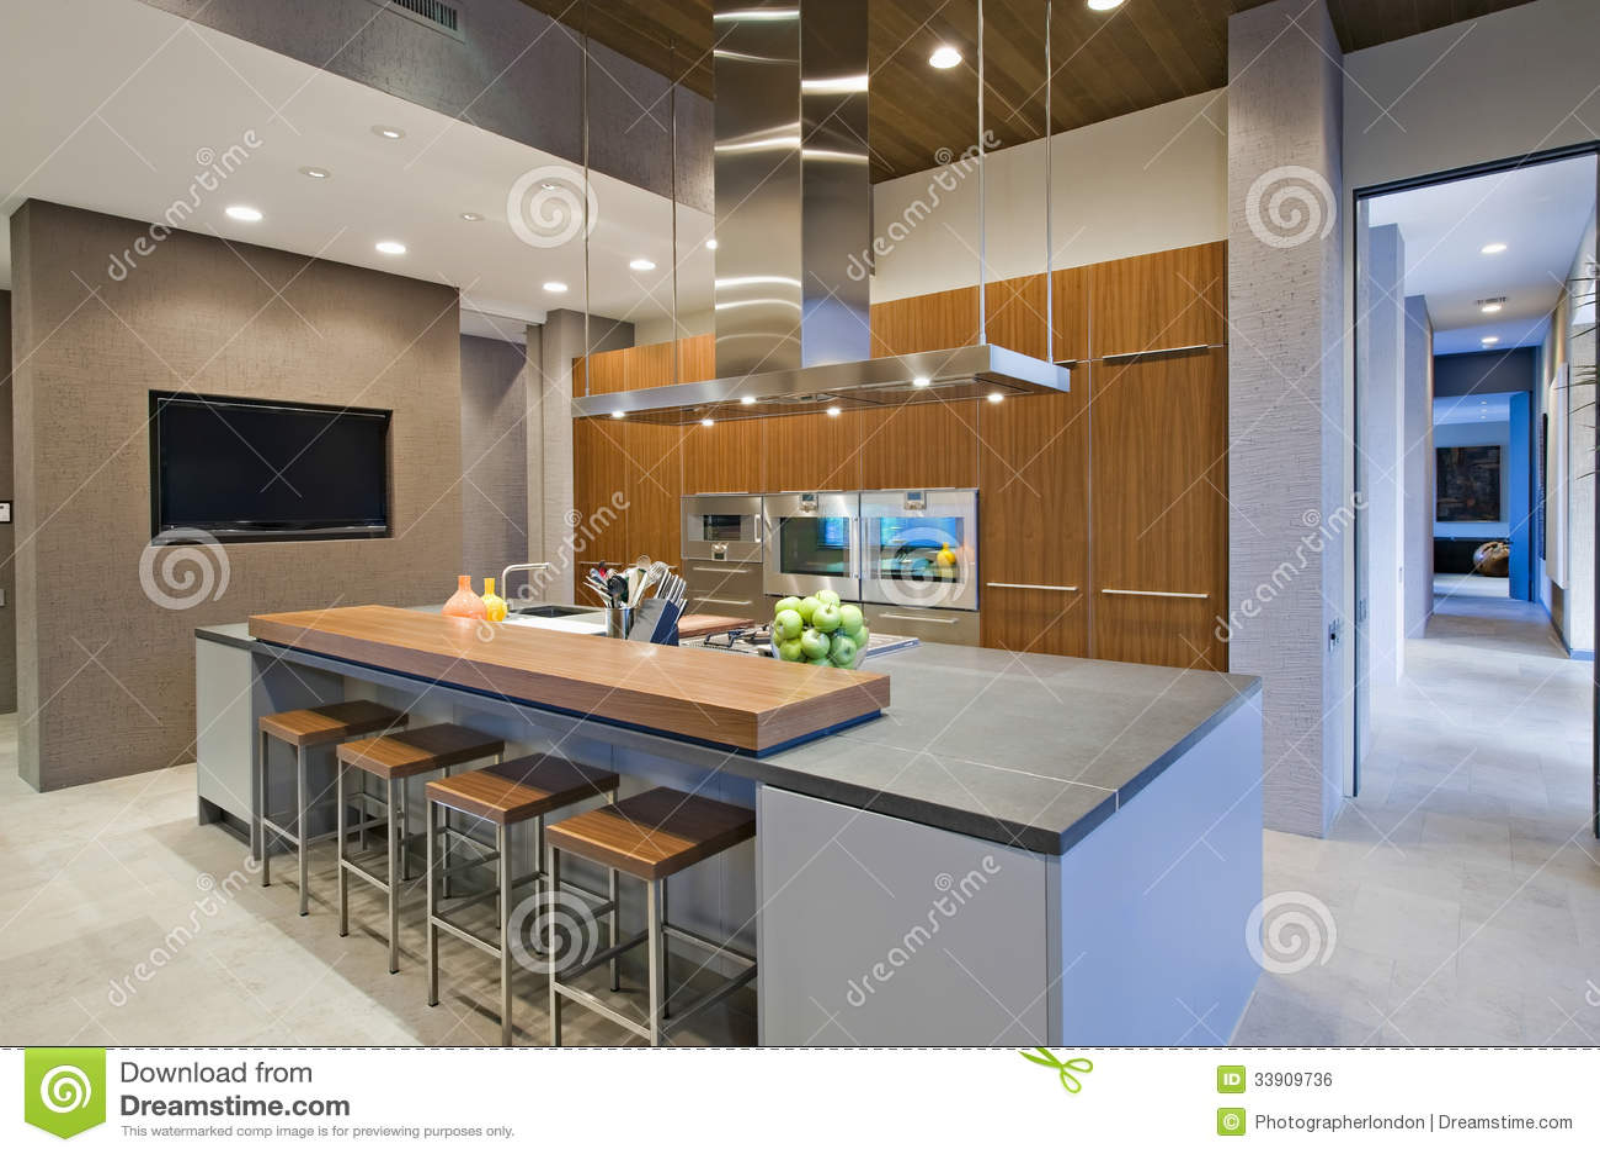 kitchen bar stool design 在早餐吧台的高凳在厨房里库存照片 图片包括有最高限额 现代 里面 在早餐吧台的高凳在厨房里